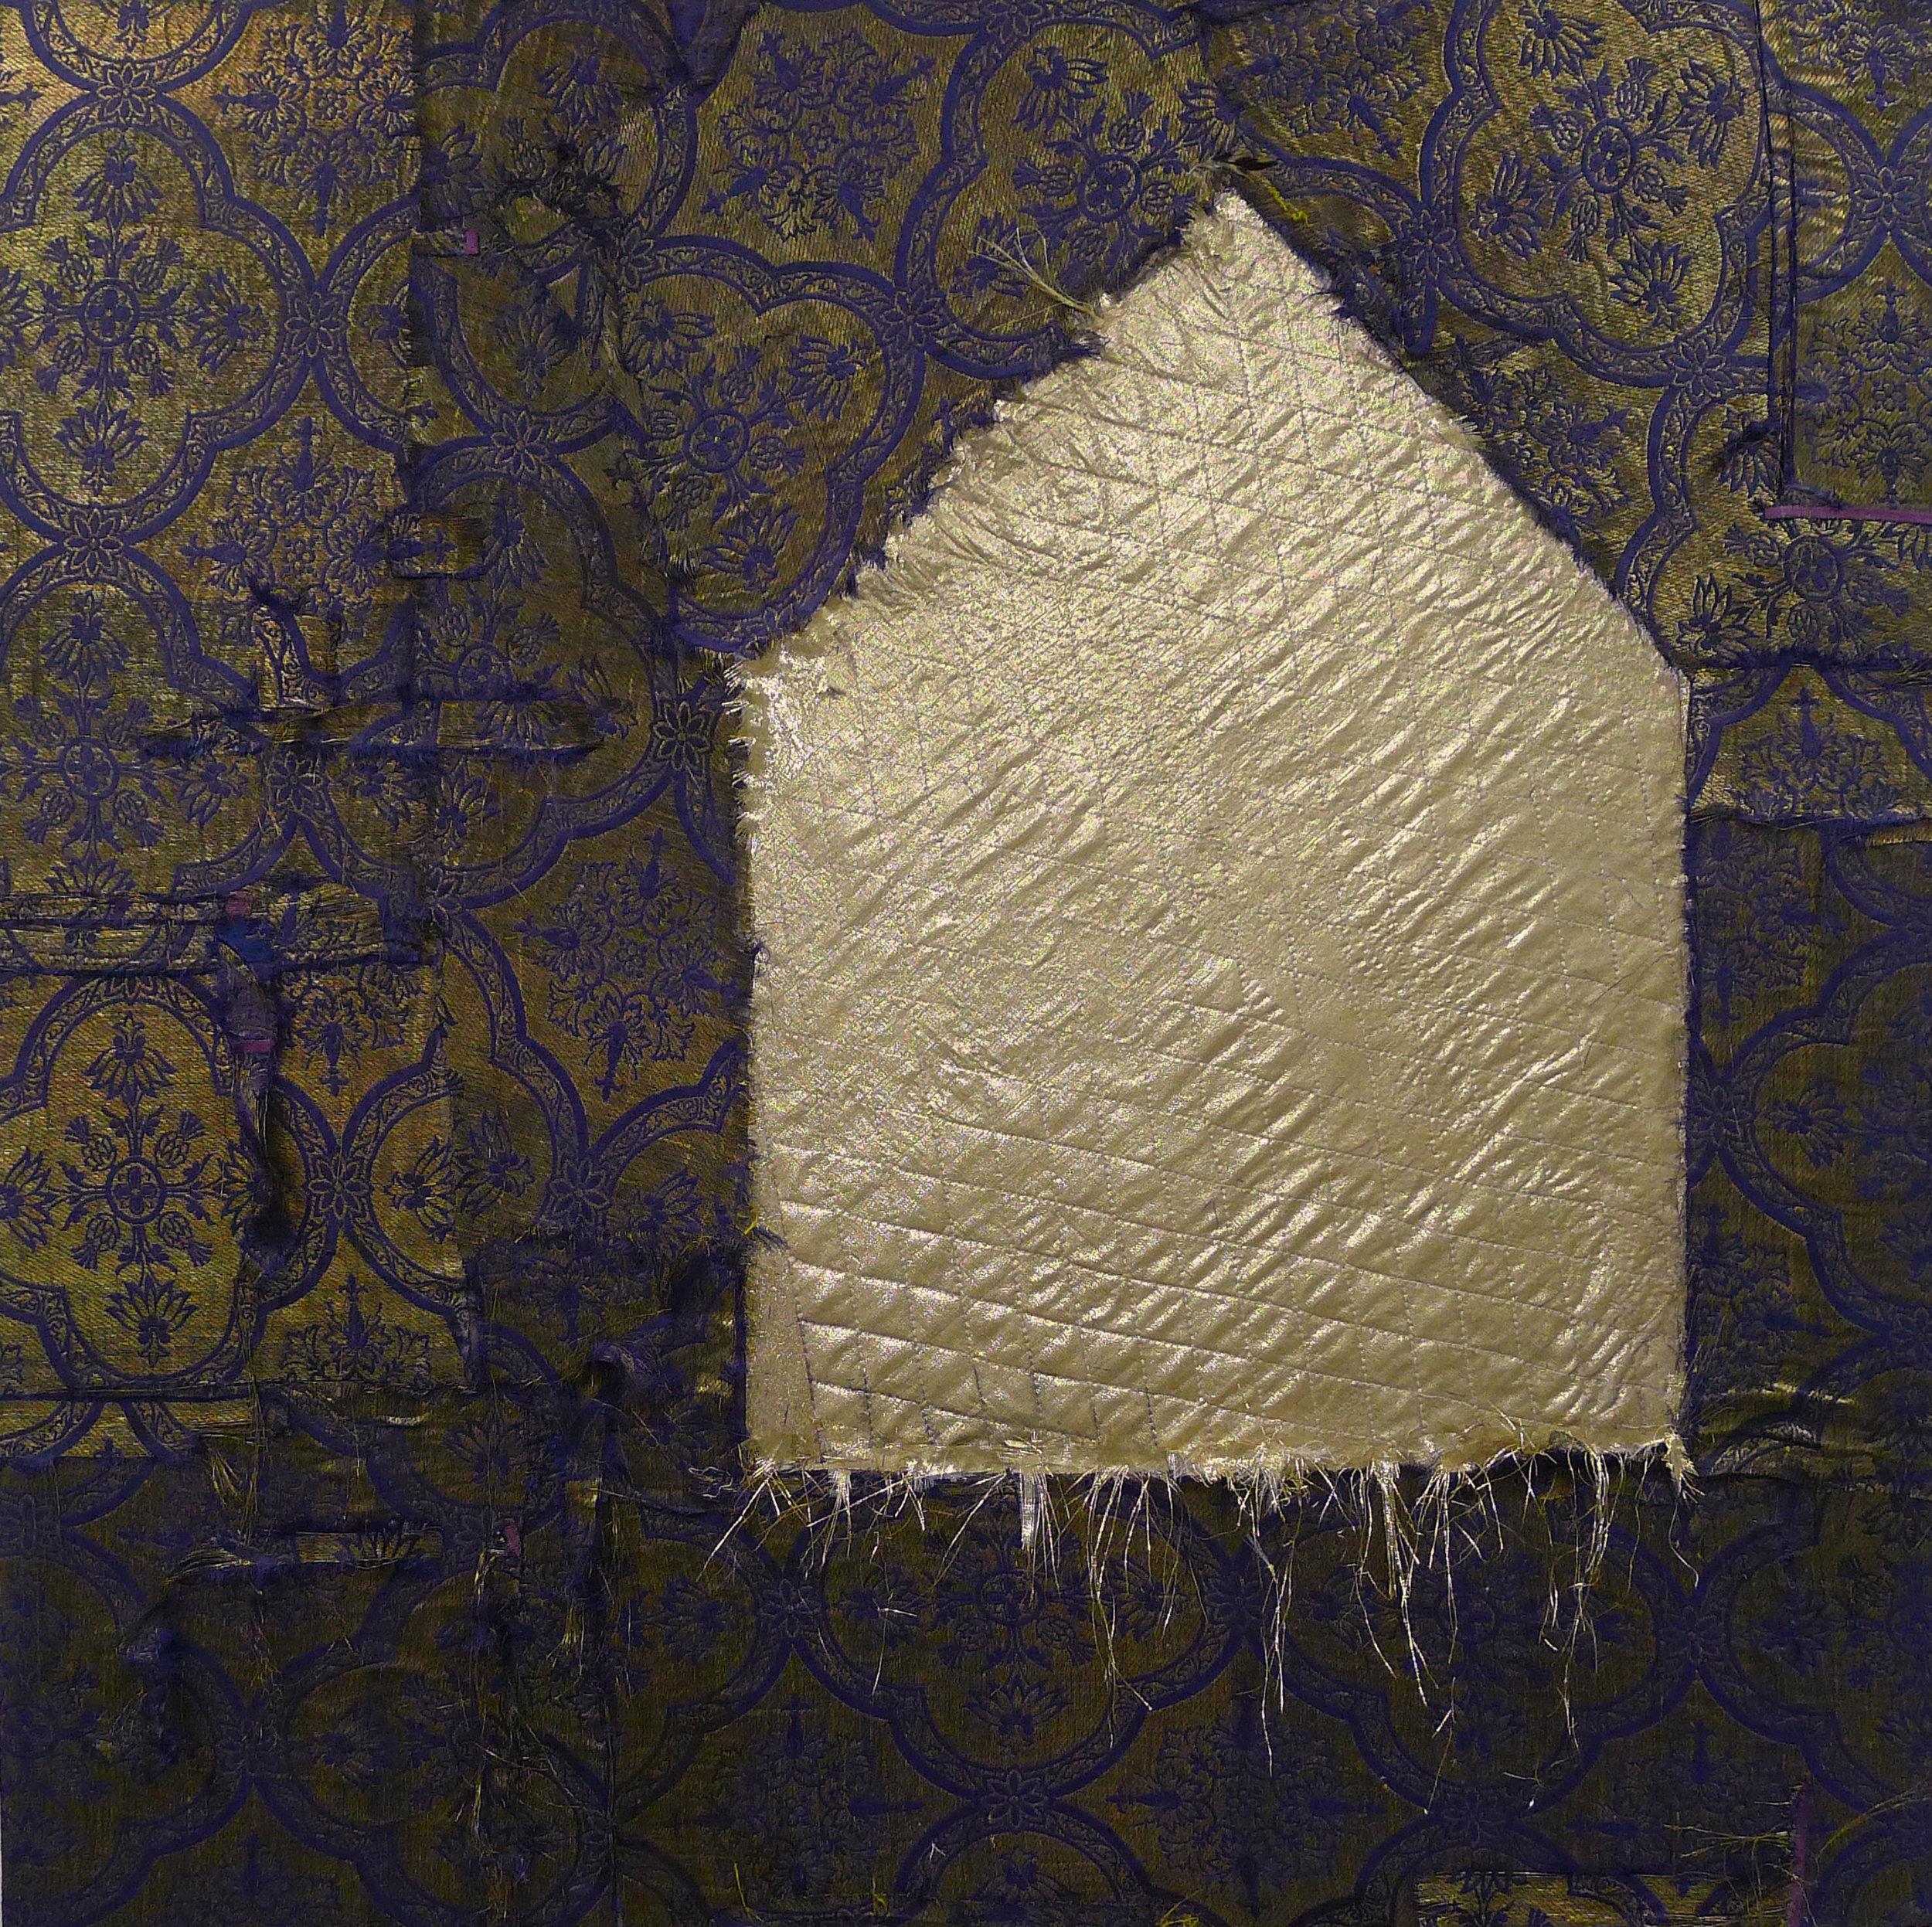 Brenda Cirioni,  Gold House,  Fabric, 30x30